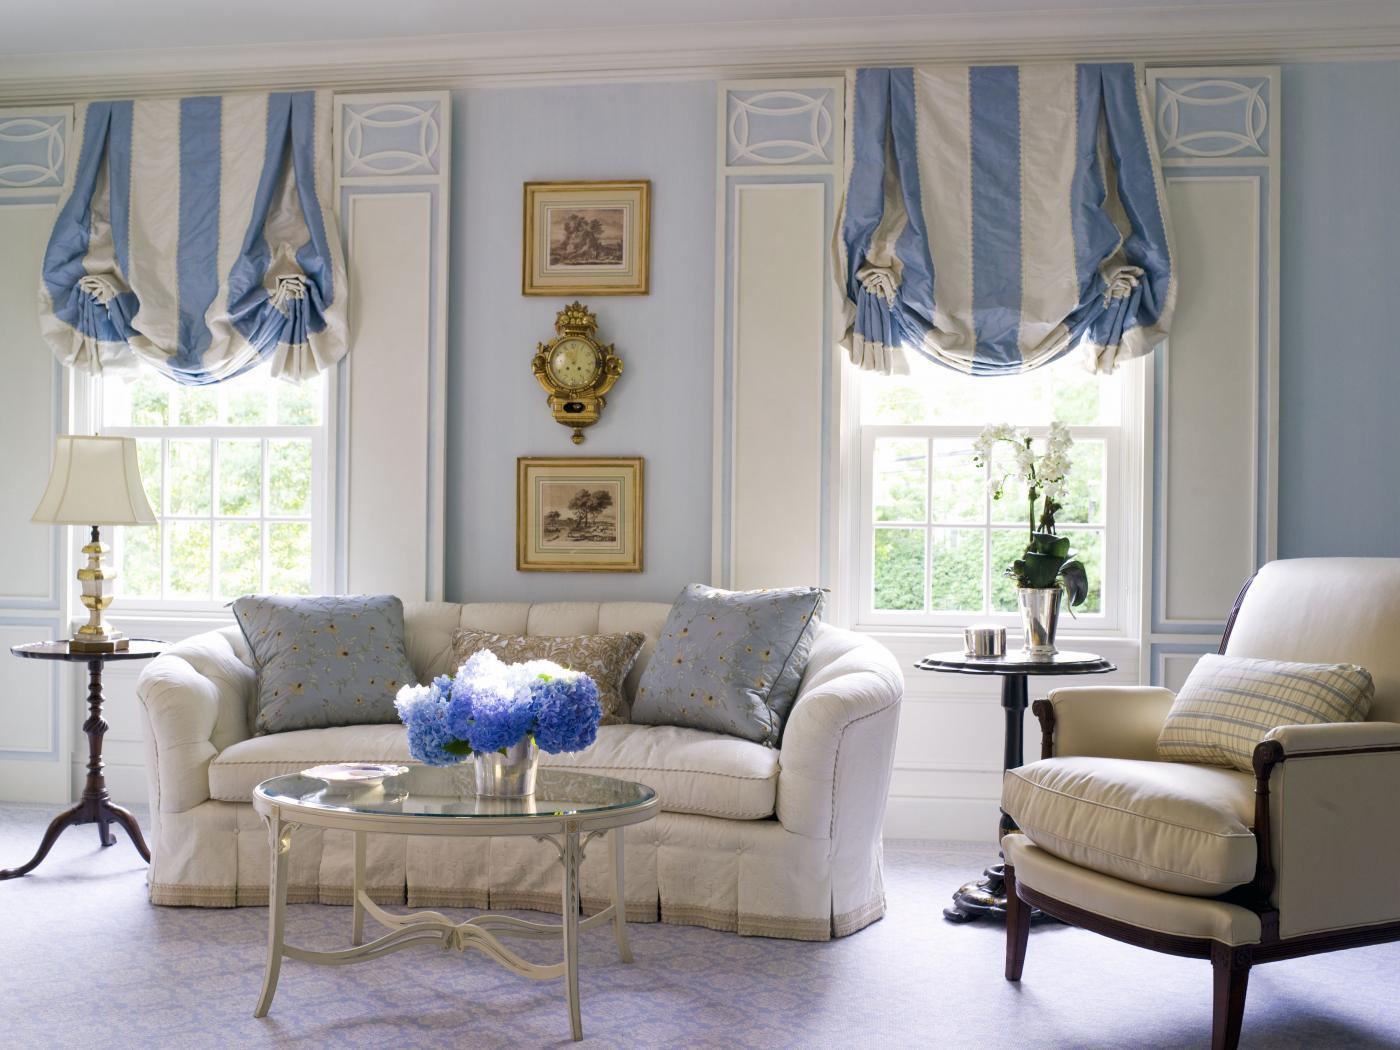 An Interior By Matthew Patrick Smyth.